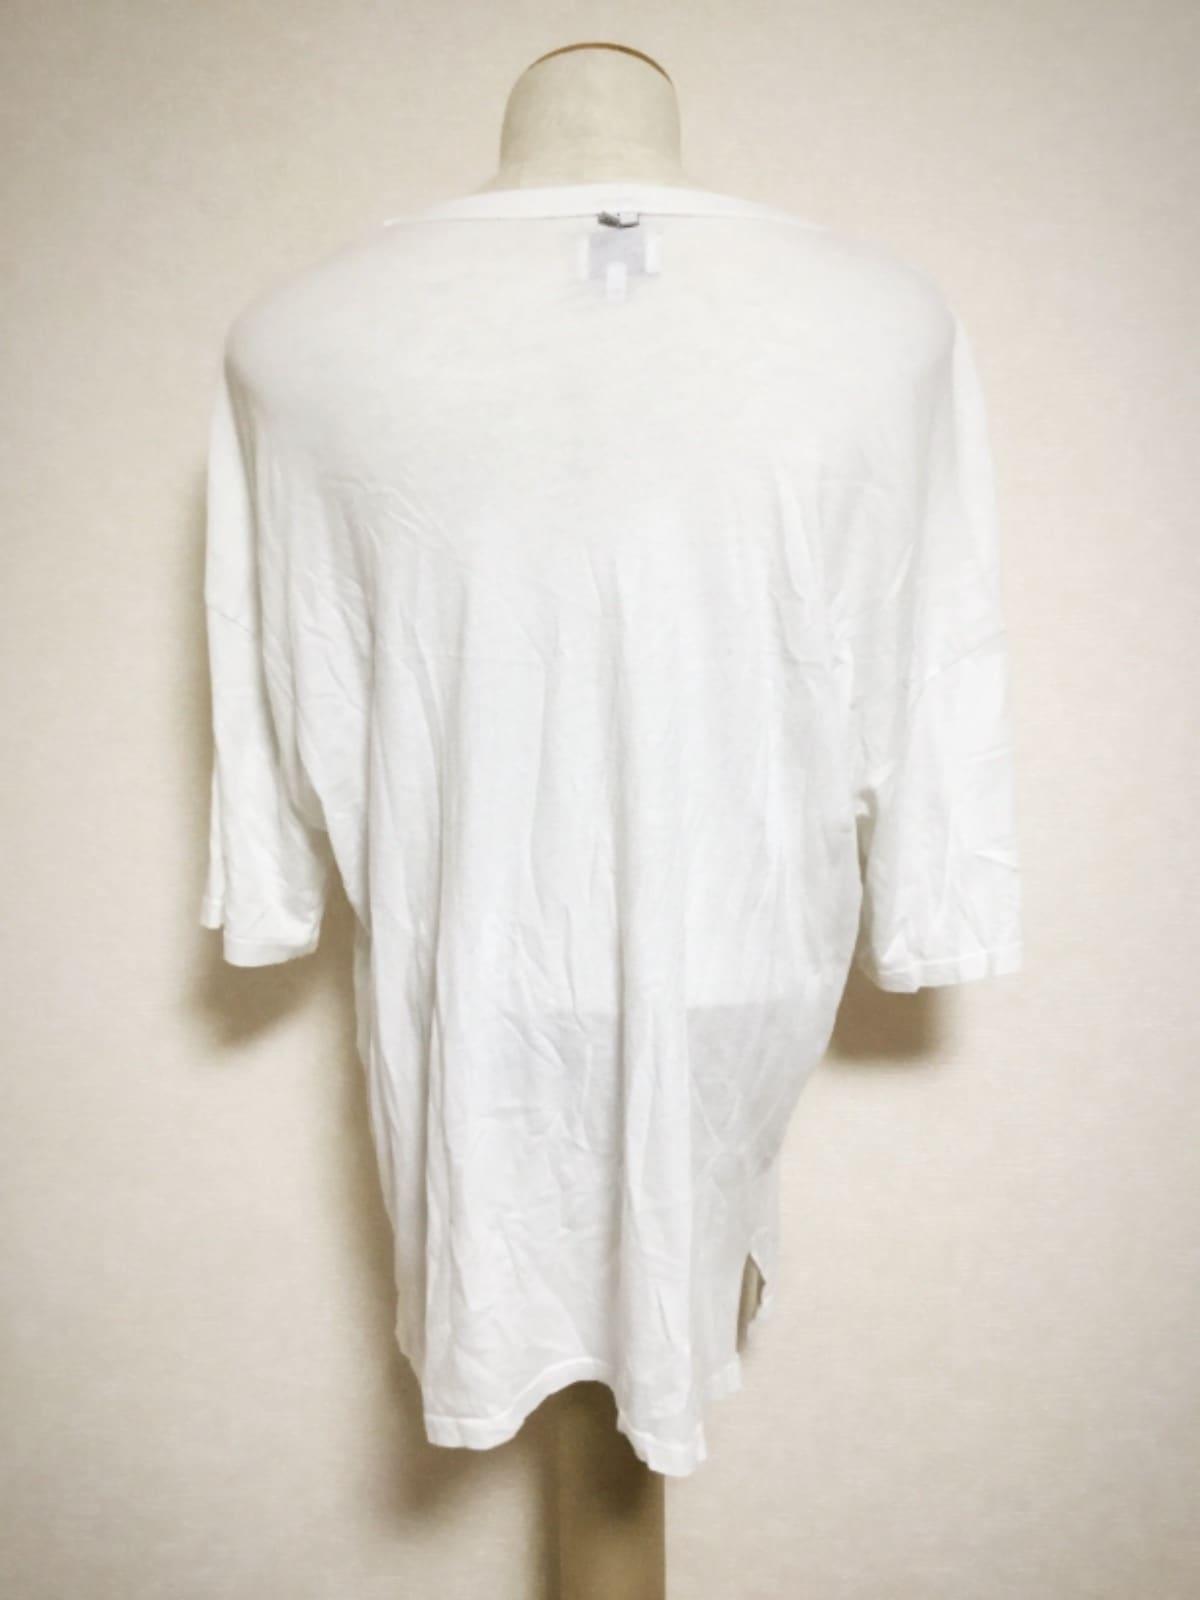 undecoratedMAN(yoshio kubo)(アンデコレイテッドマン ヨシオクボ)のTシャツ